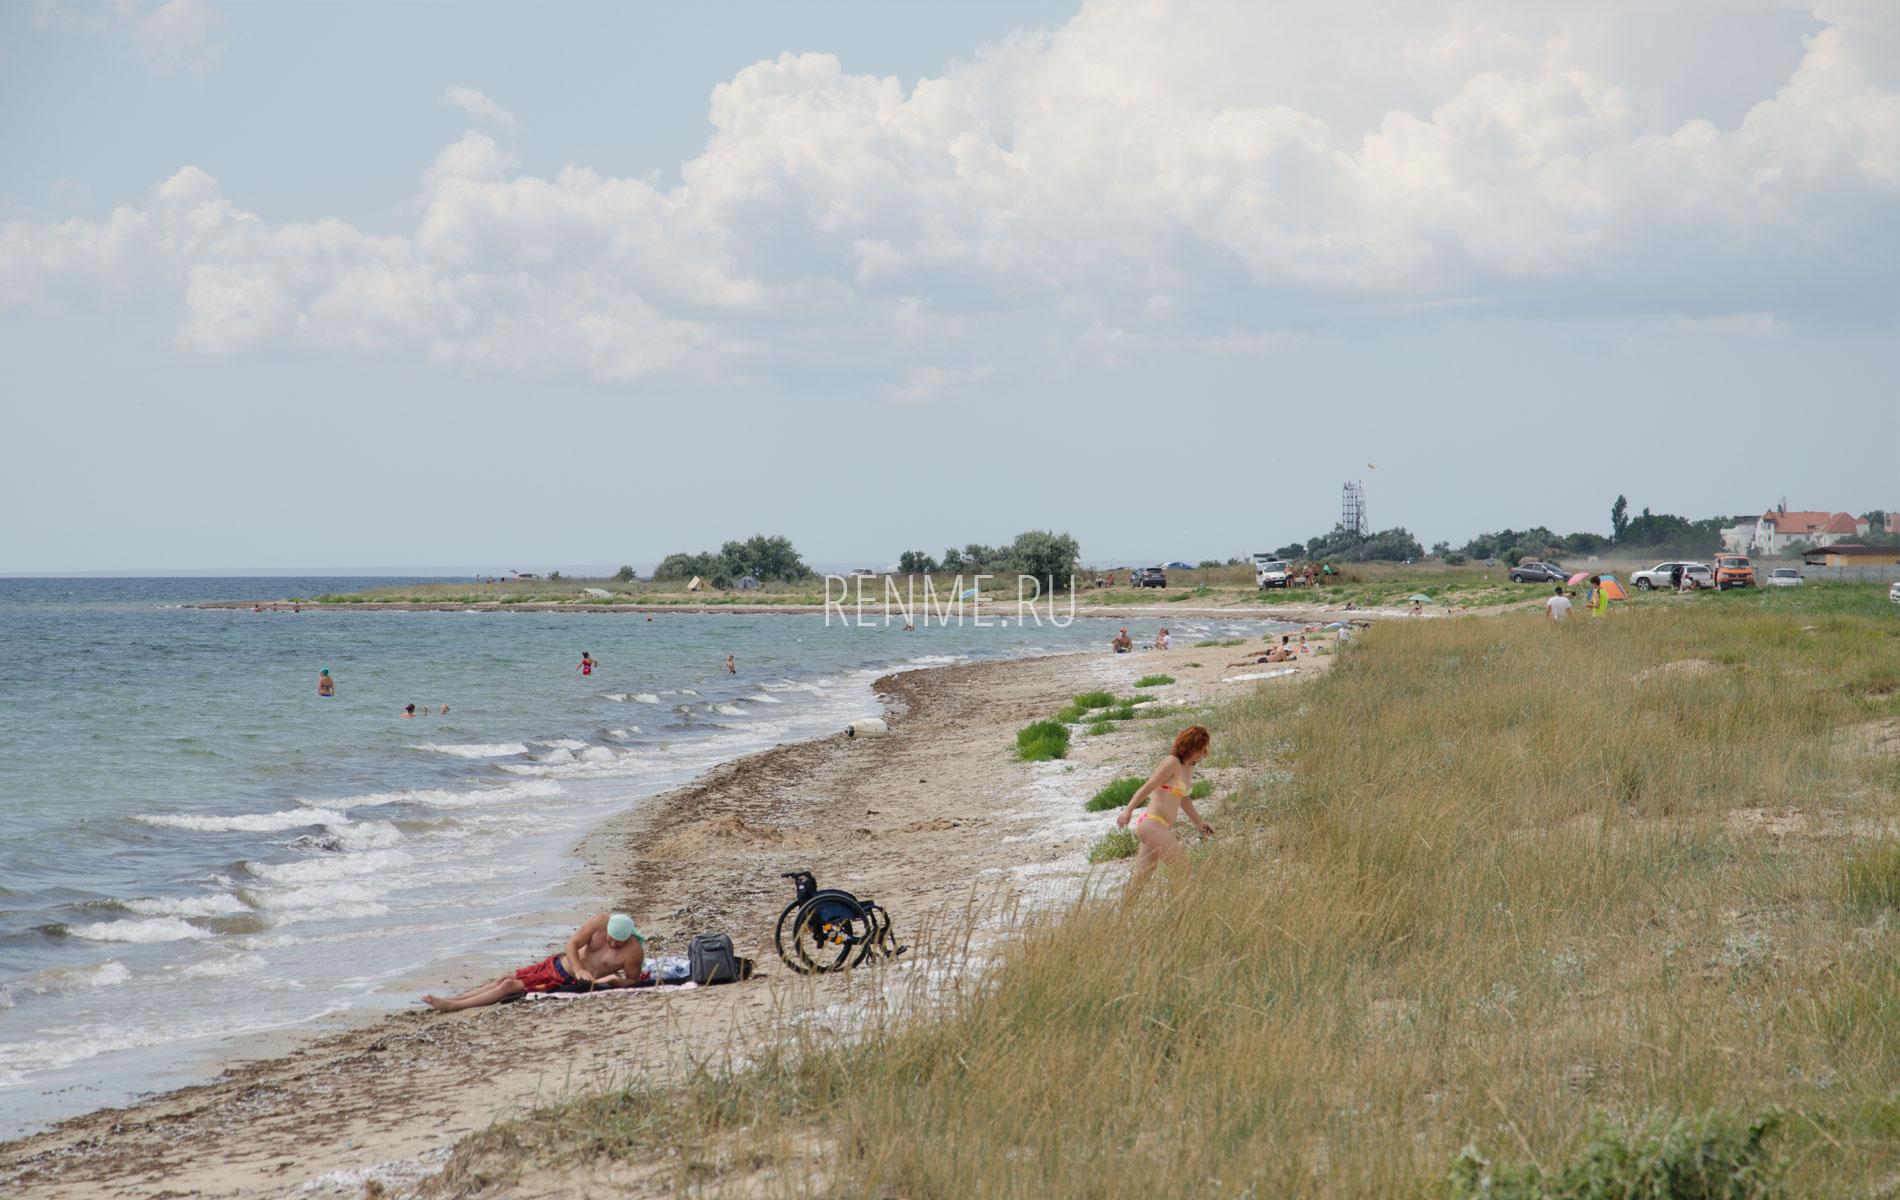 Дикий пляж между Витино и Молочным. Фото Молочного